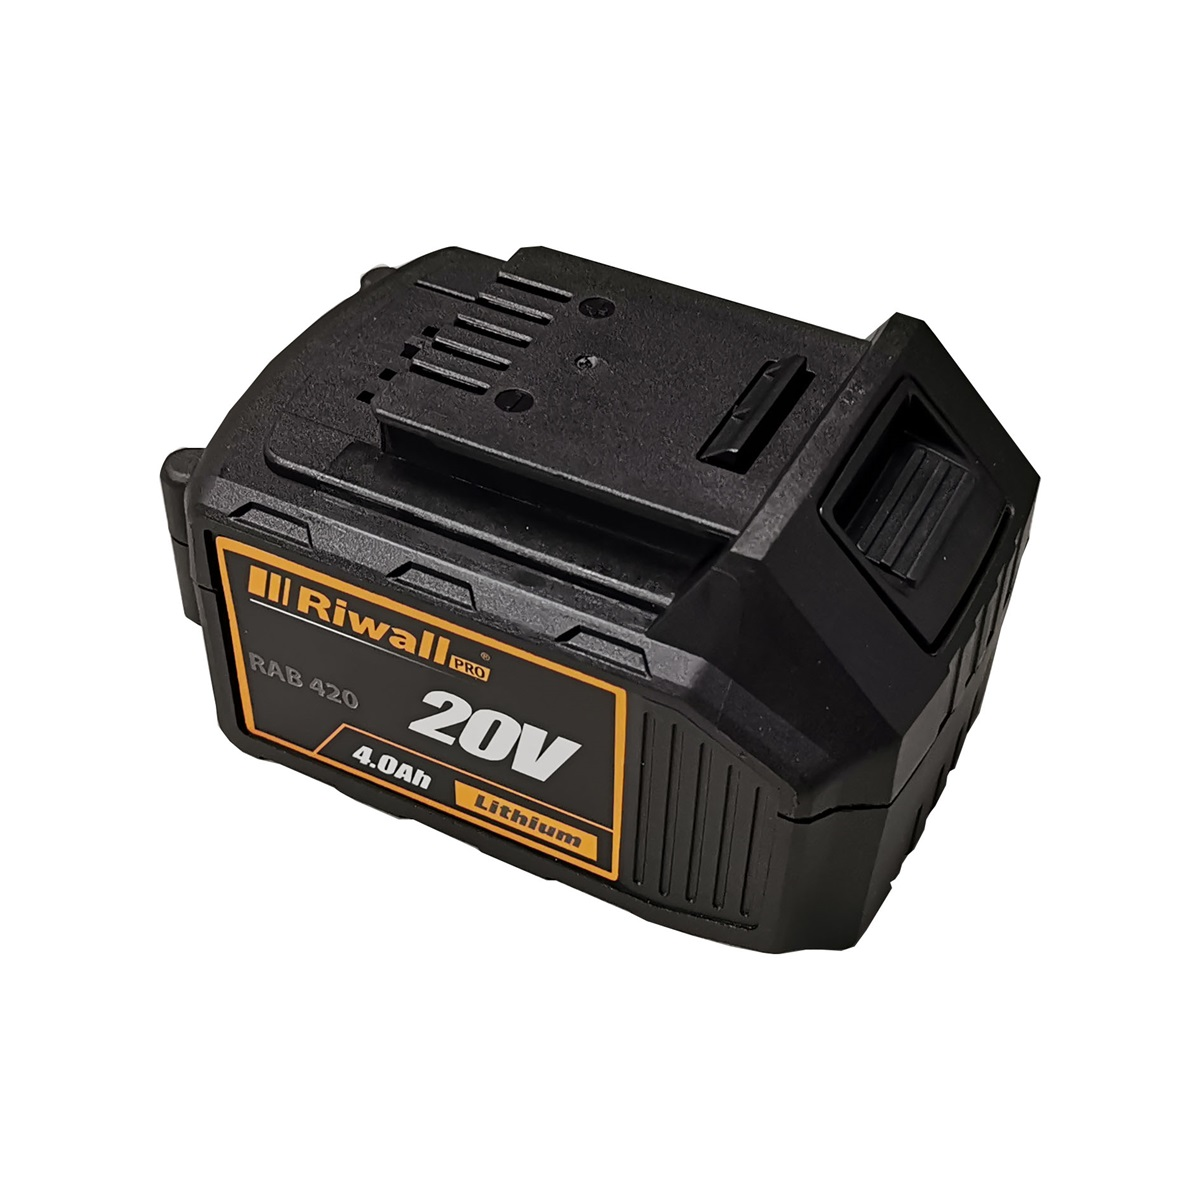 Riwall PRO RAB 420 baterie 20 V (4 Ah)